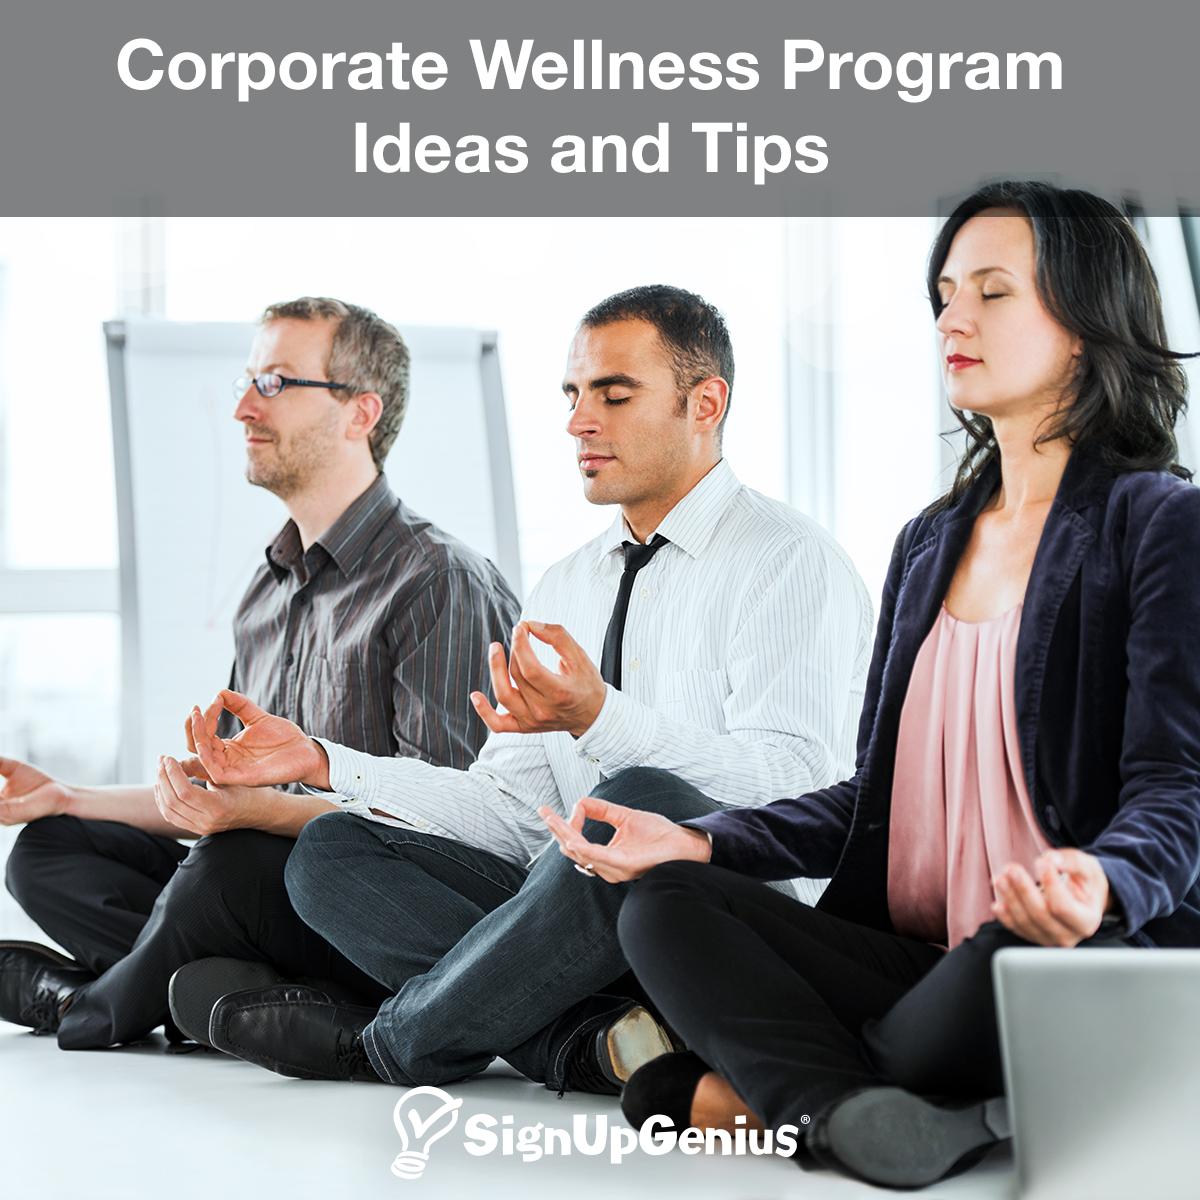 employee wellness programs ideas